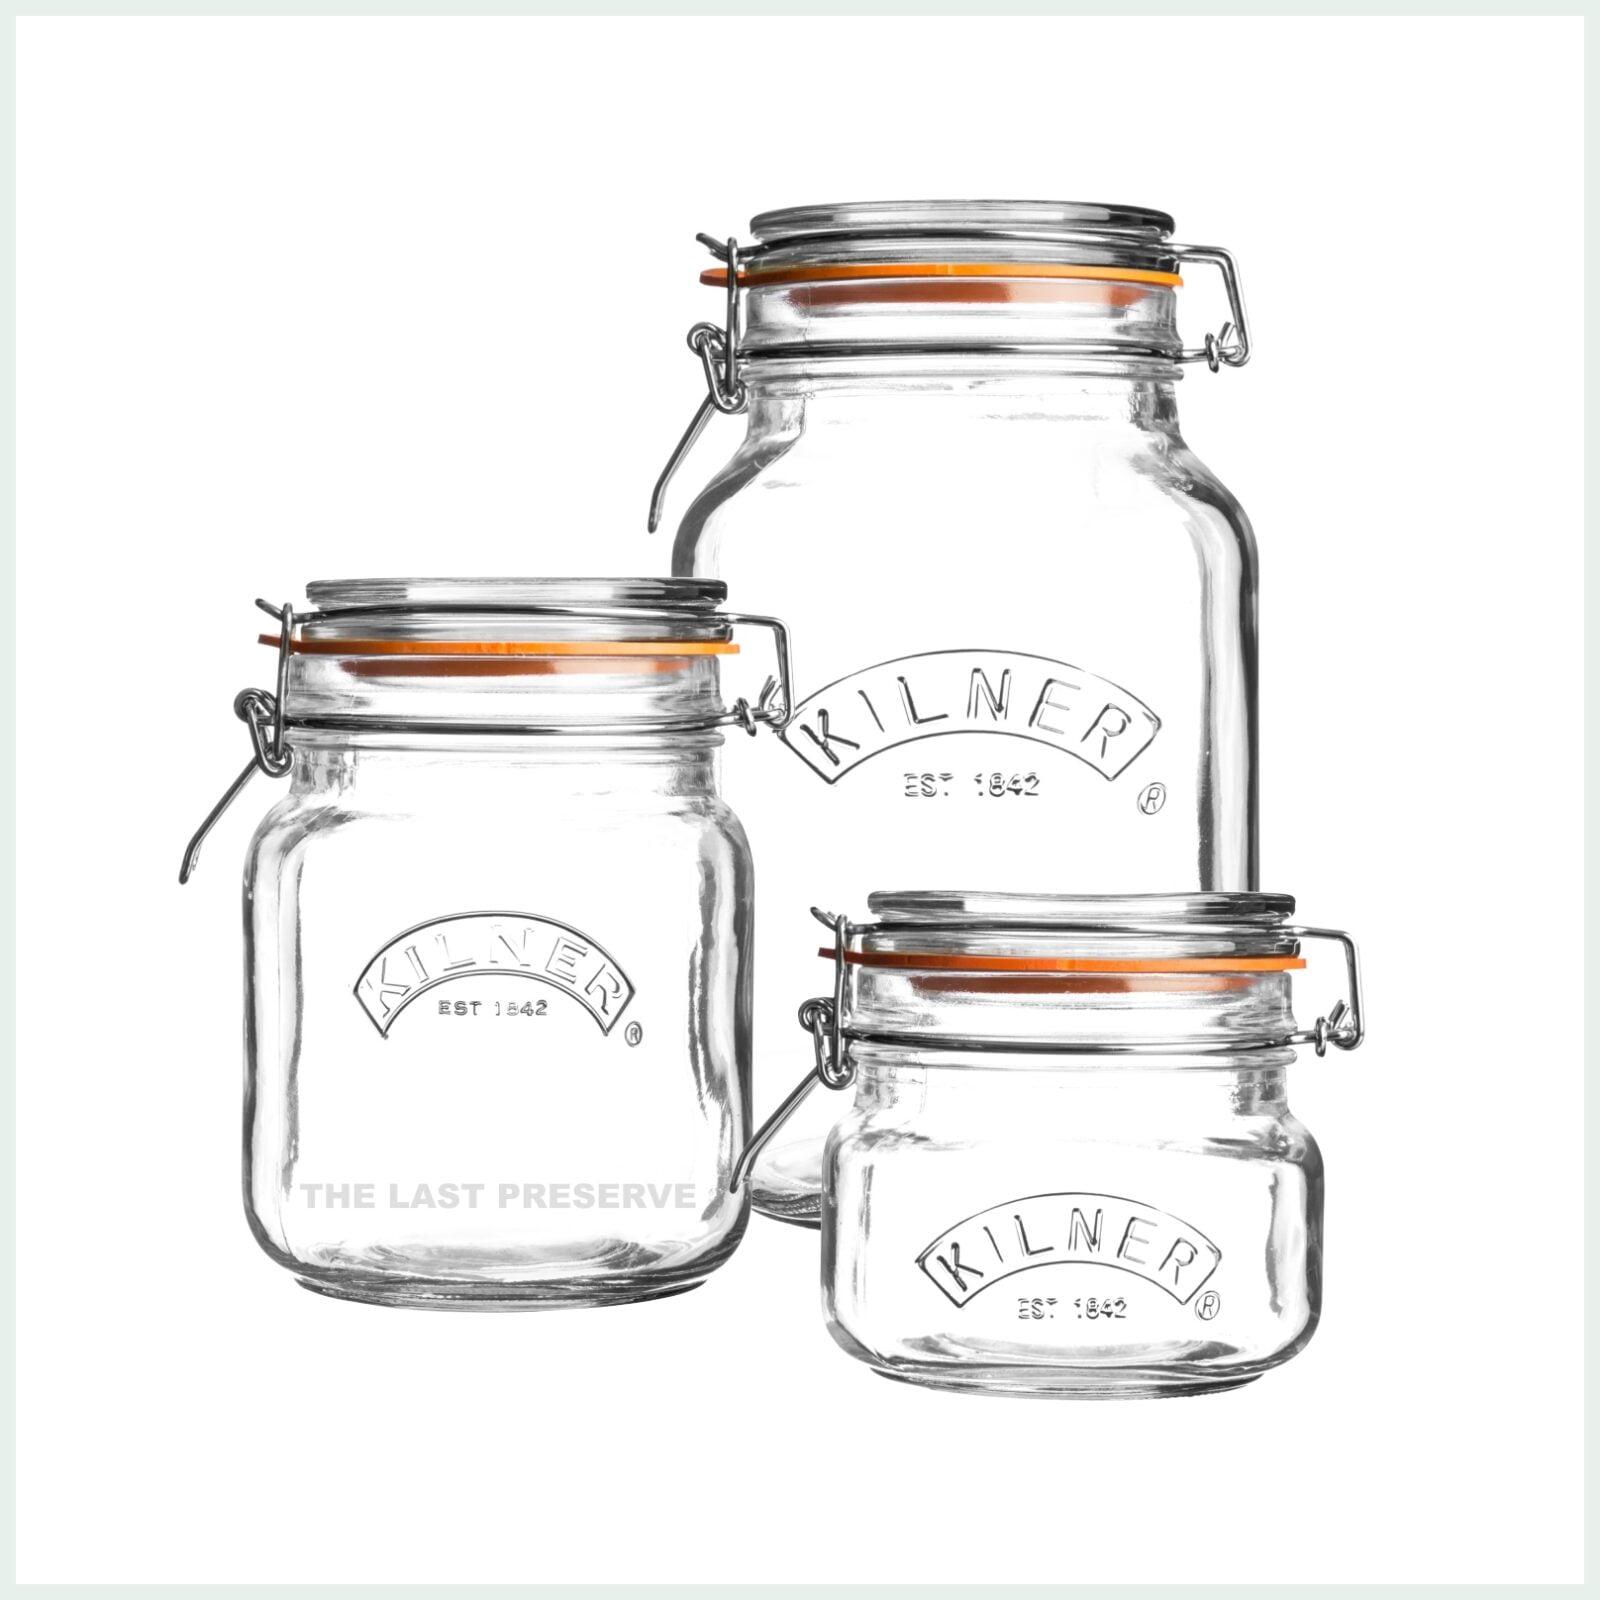 kilner square clip top jars for preserving, canning and jam making